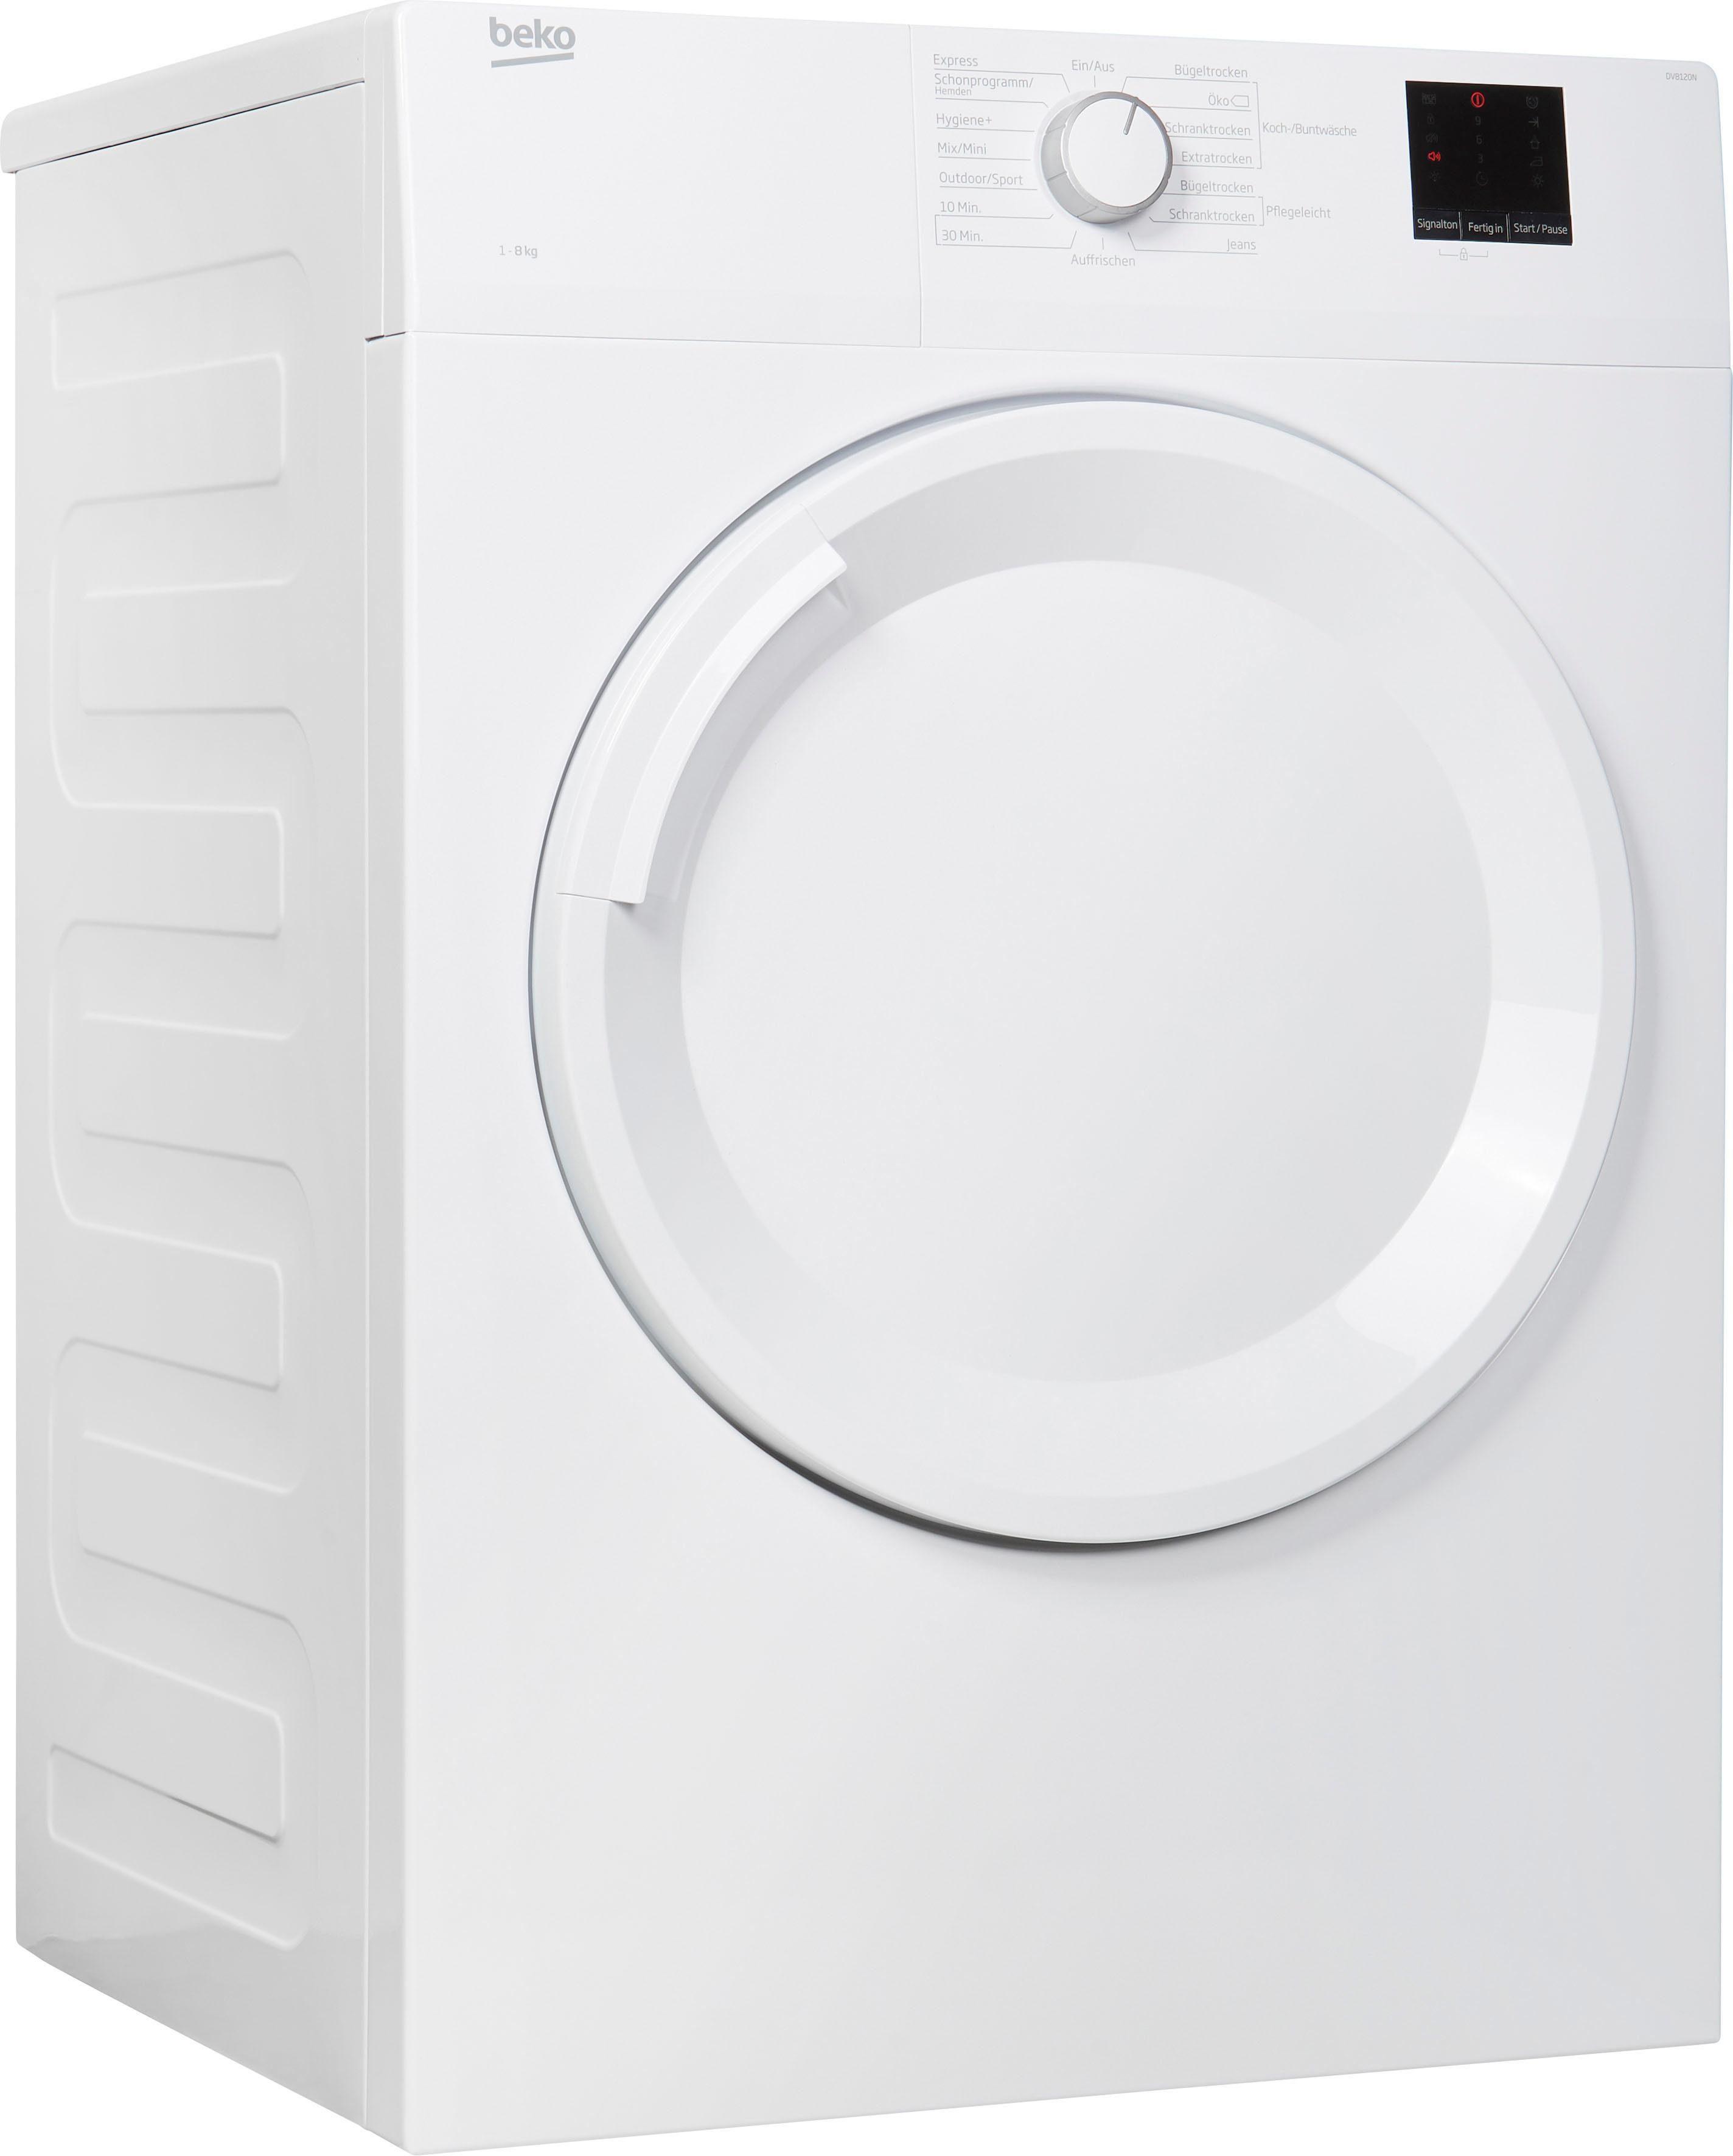 BEKO Ablufttrockner DV8120N, 8 kg   Bad > Waschmaschinen und Trockner > Ablufttrockner   Beko